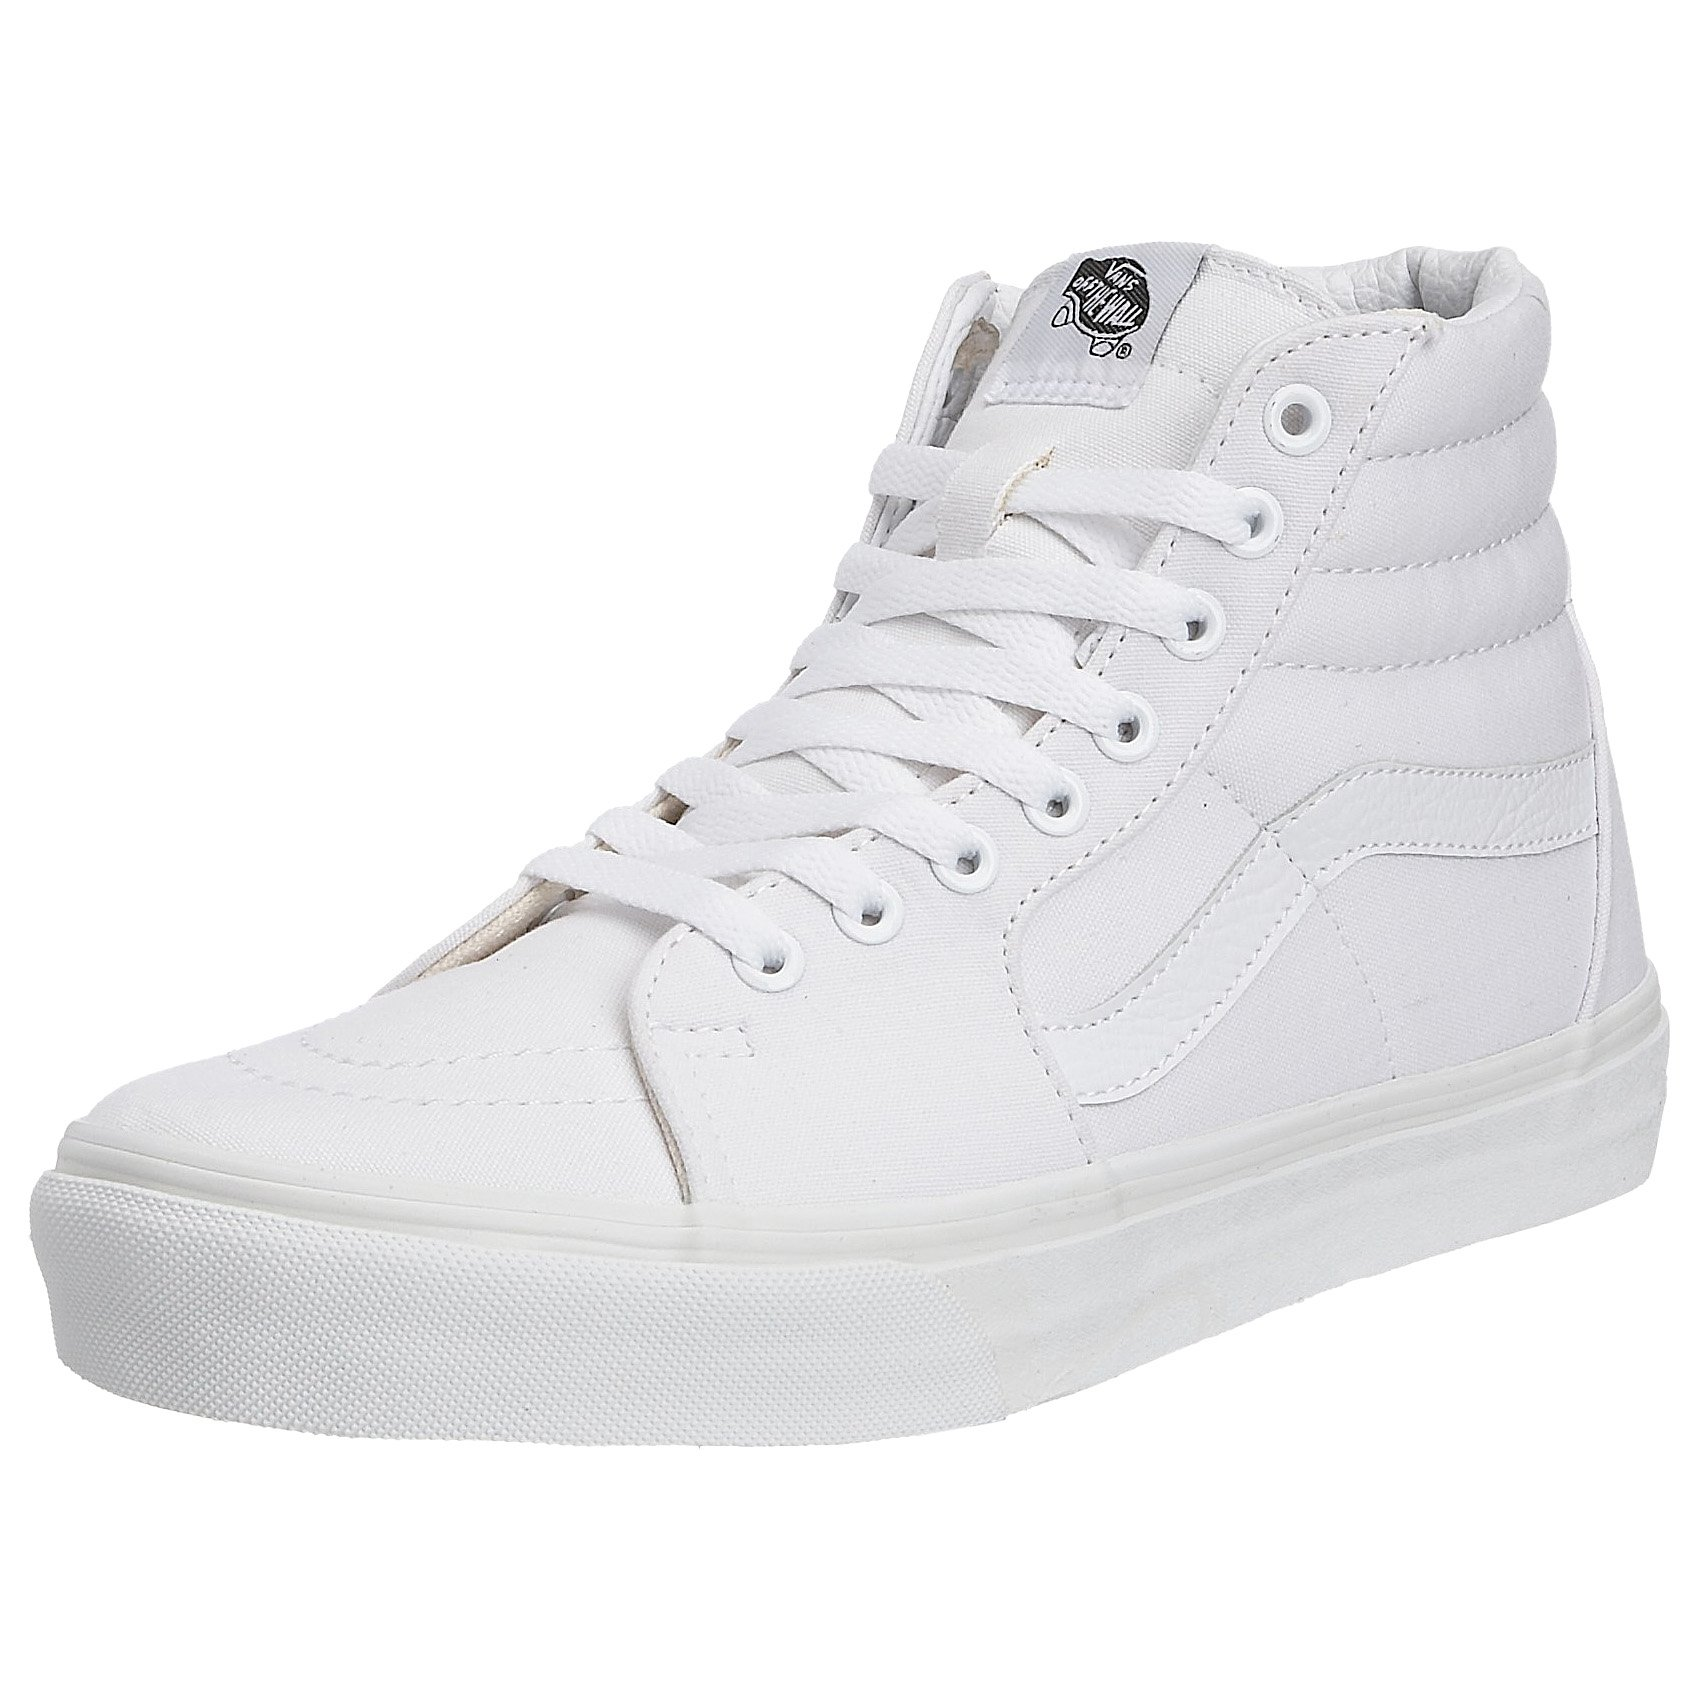 97ac8f84a7 Get Quotations · Vans Sk8-Hi Unisex Casual High-Top Skate Shoes